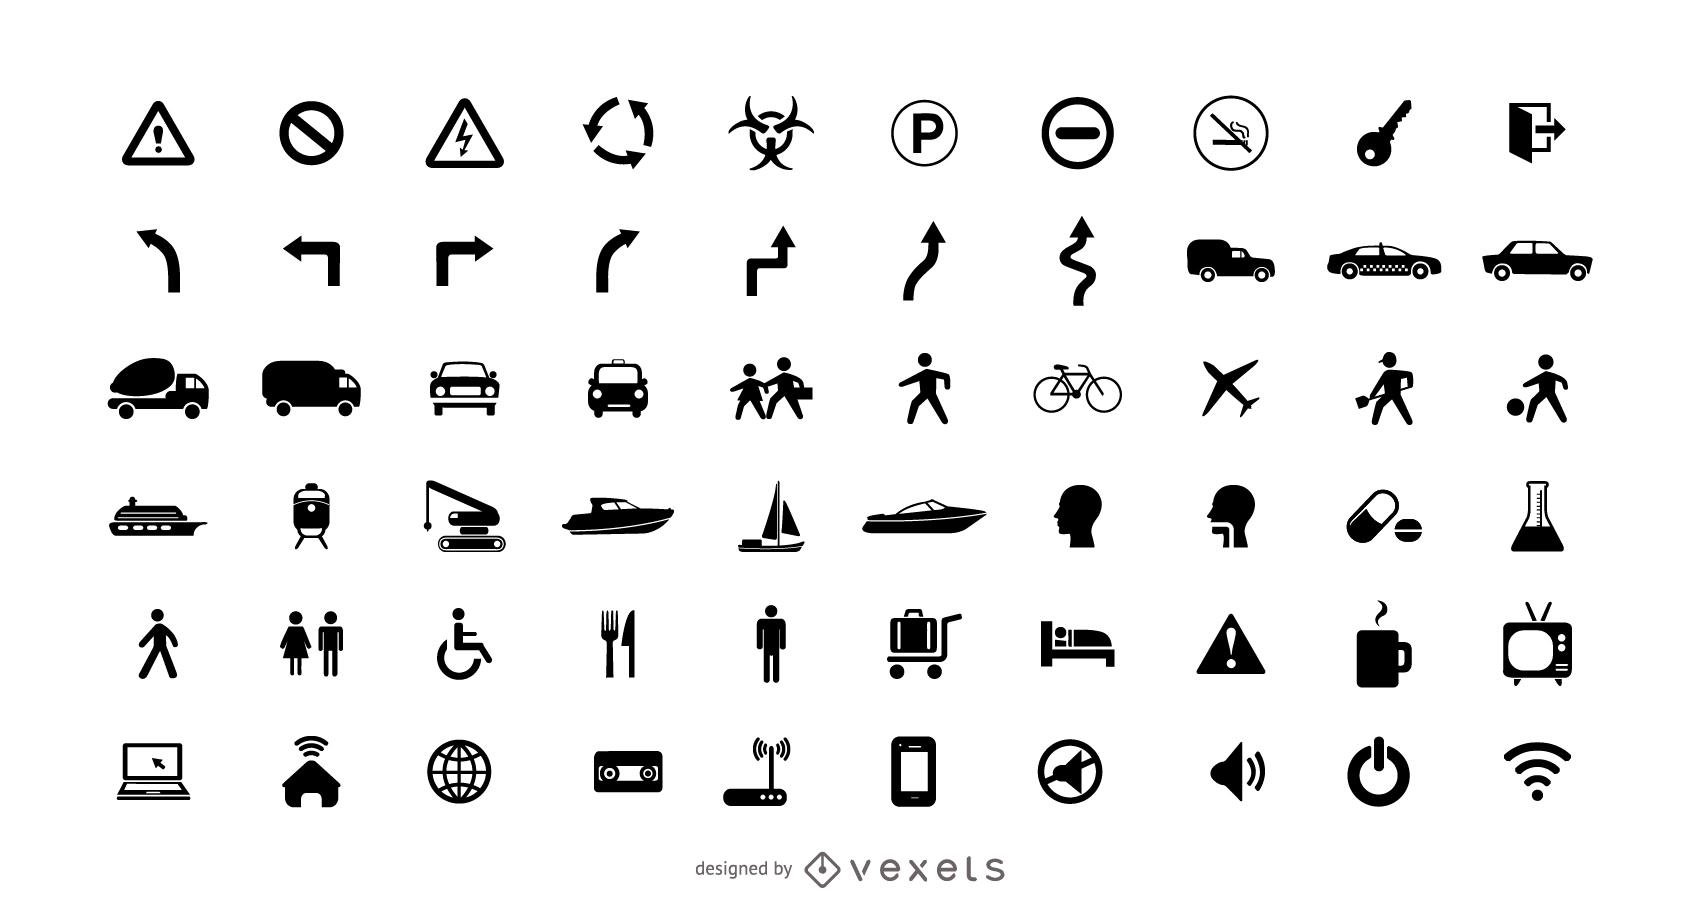 Colecci?n de iconos de pictogramas